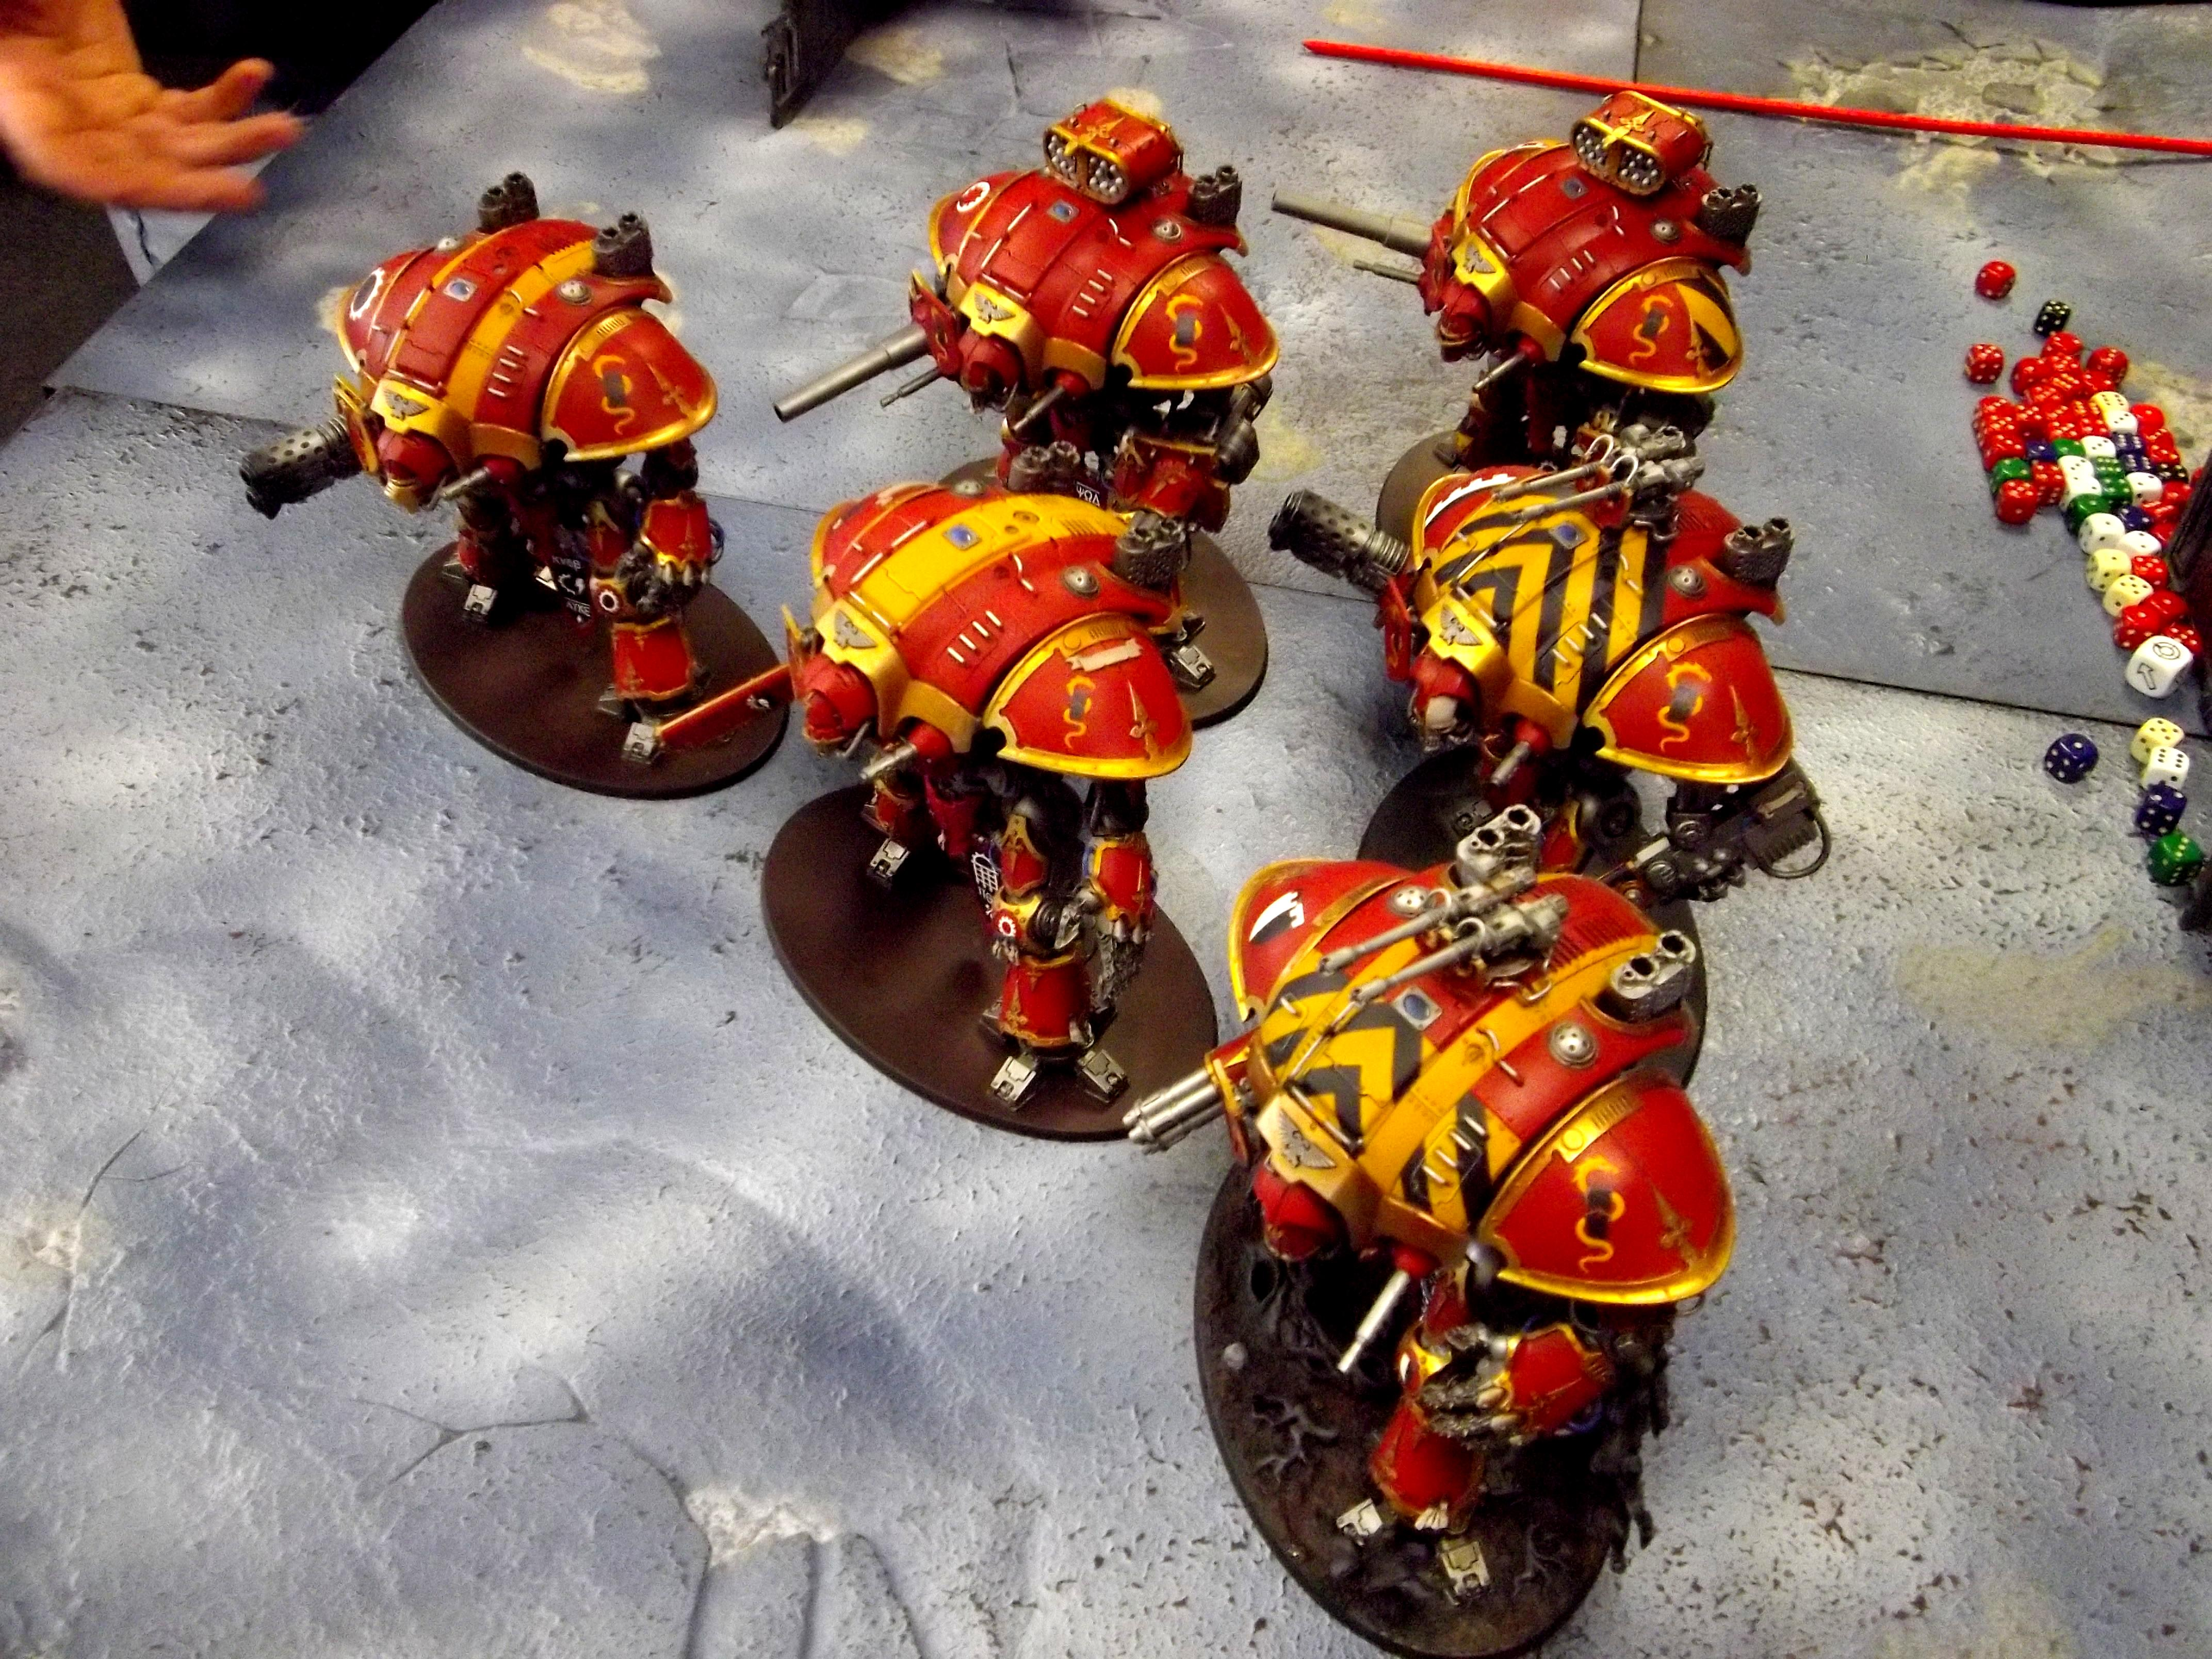 Imperial Knight, Krast, Mechanicum